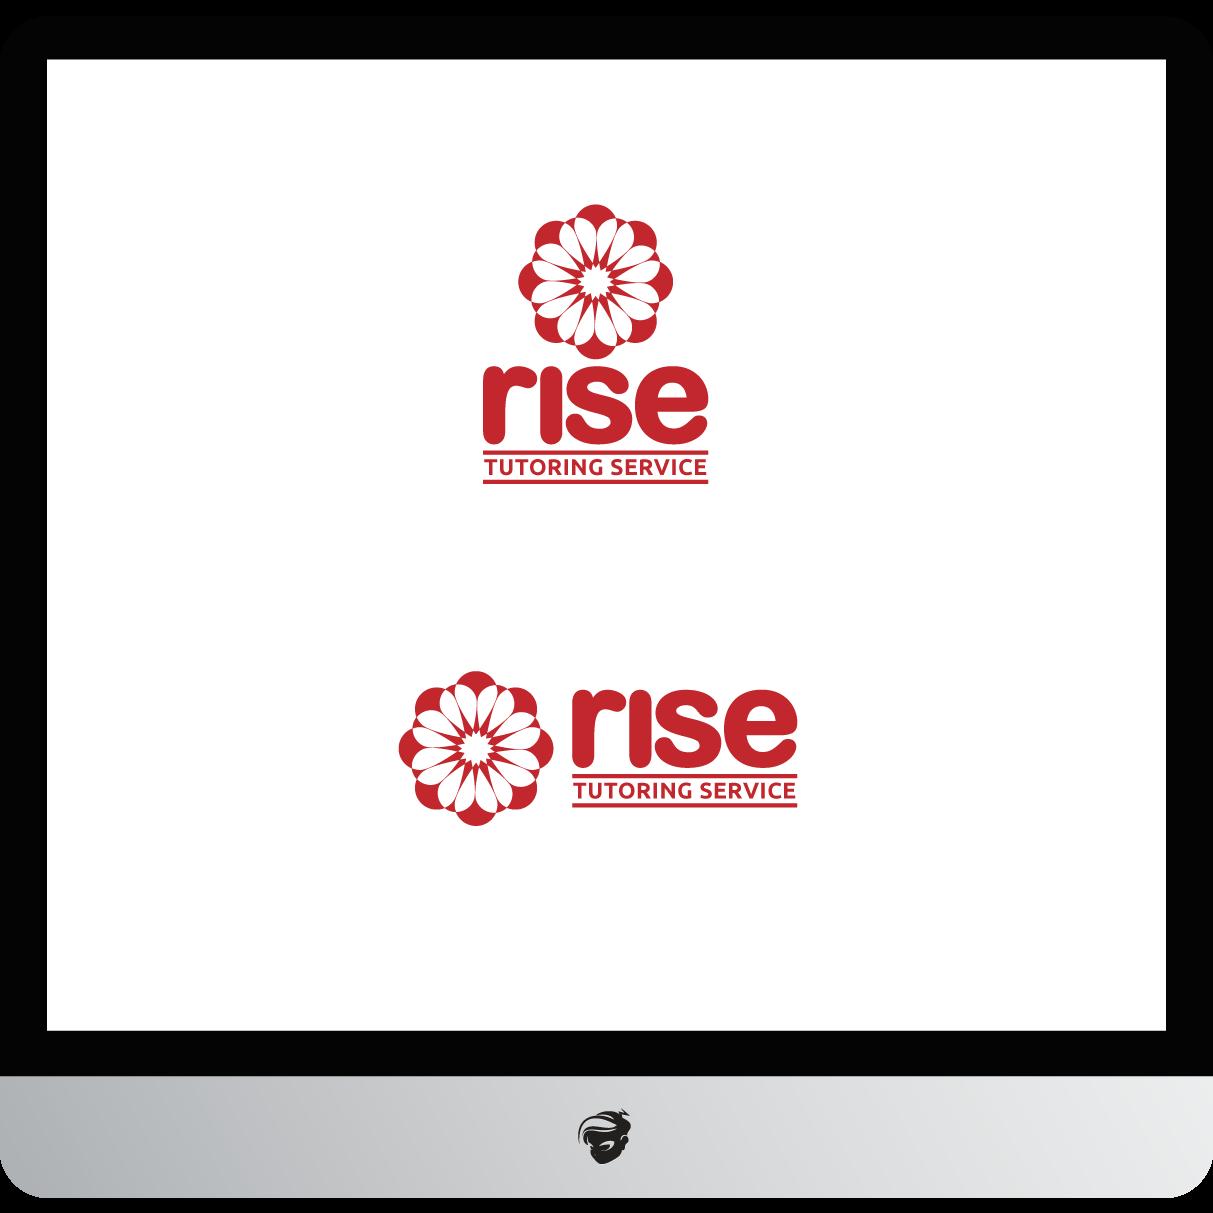 Logo Design by zesthar - Entry No. 235 in the Logo Design Contest Imaginative Logo Design for Rise Tutoring Service.